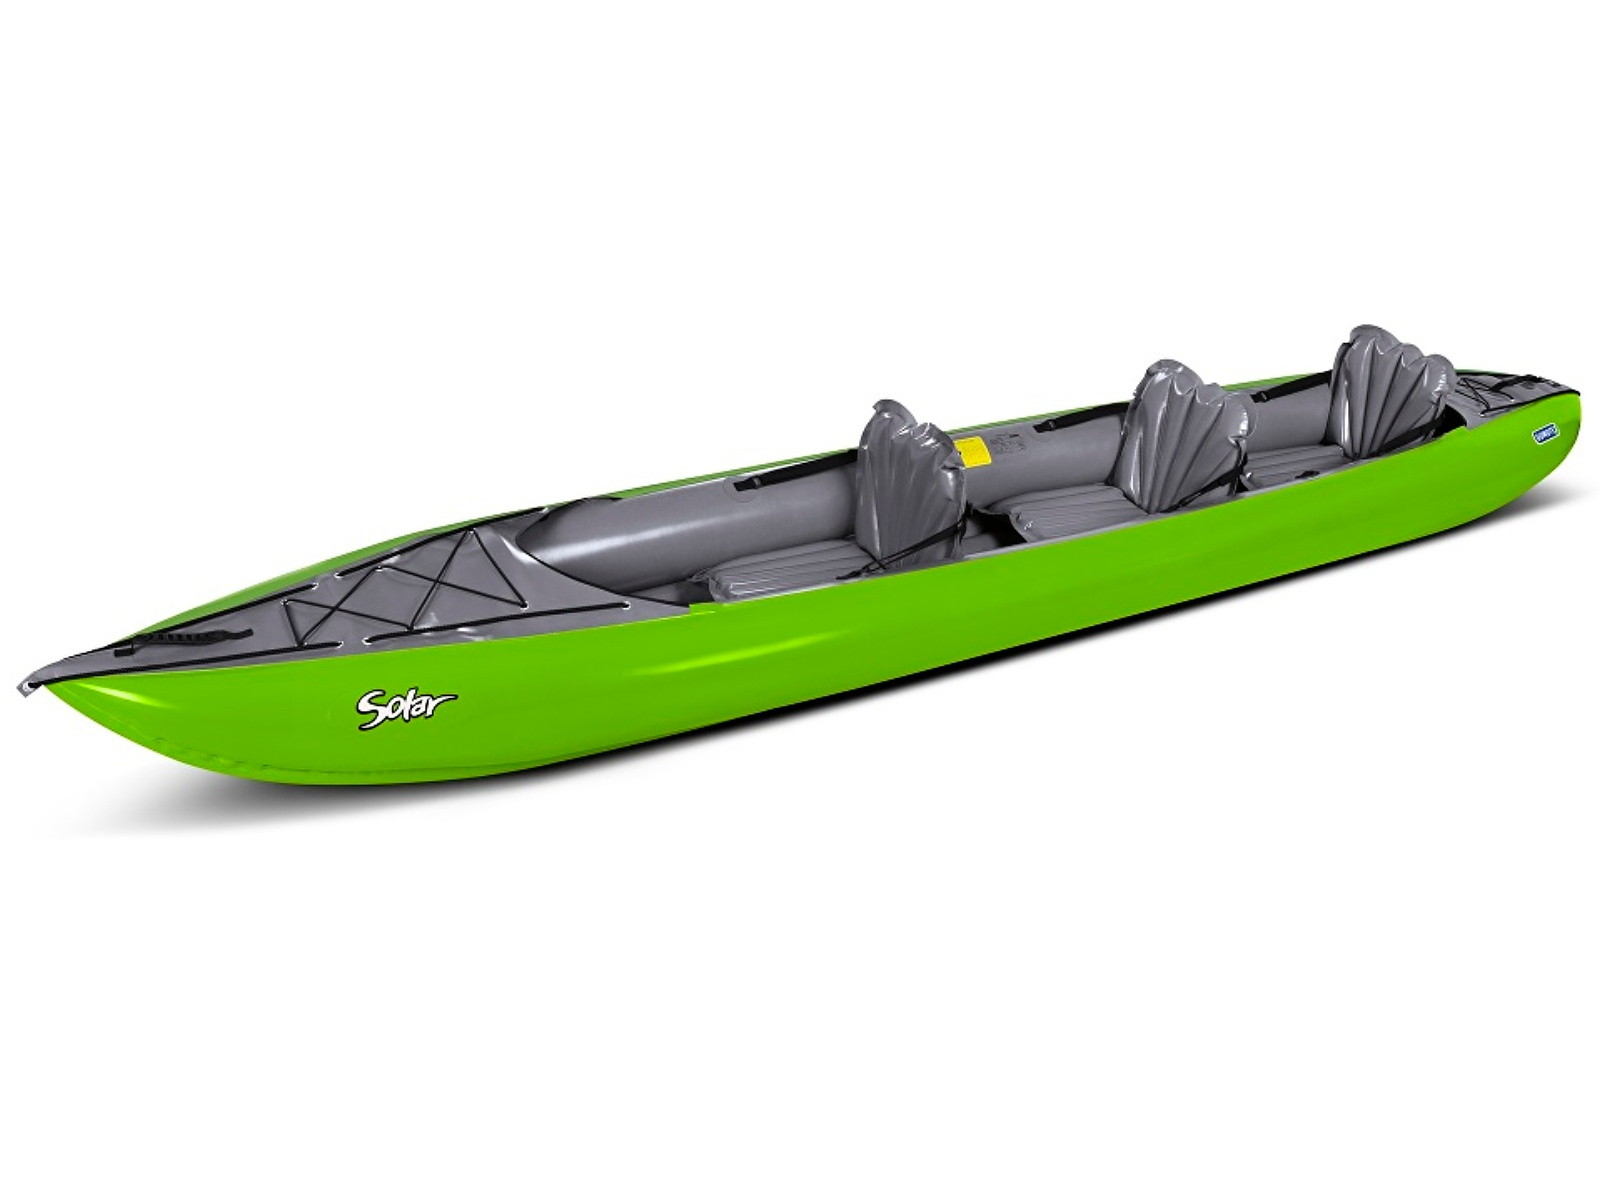 Nafukovací kajak GUMOTEX Solar 3 zeleno-šedý